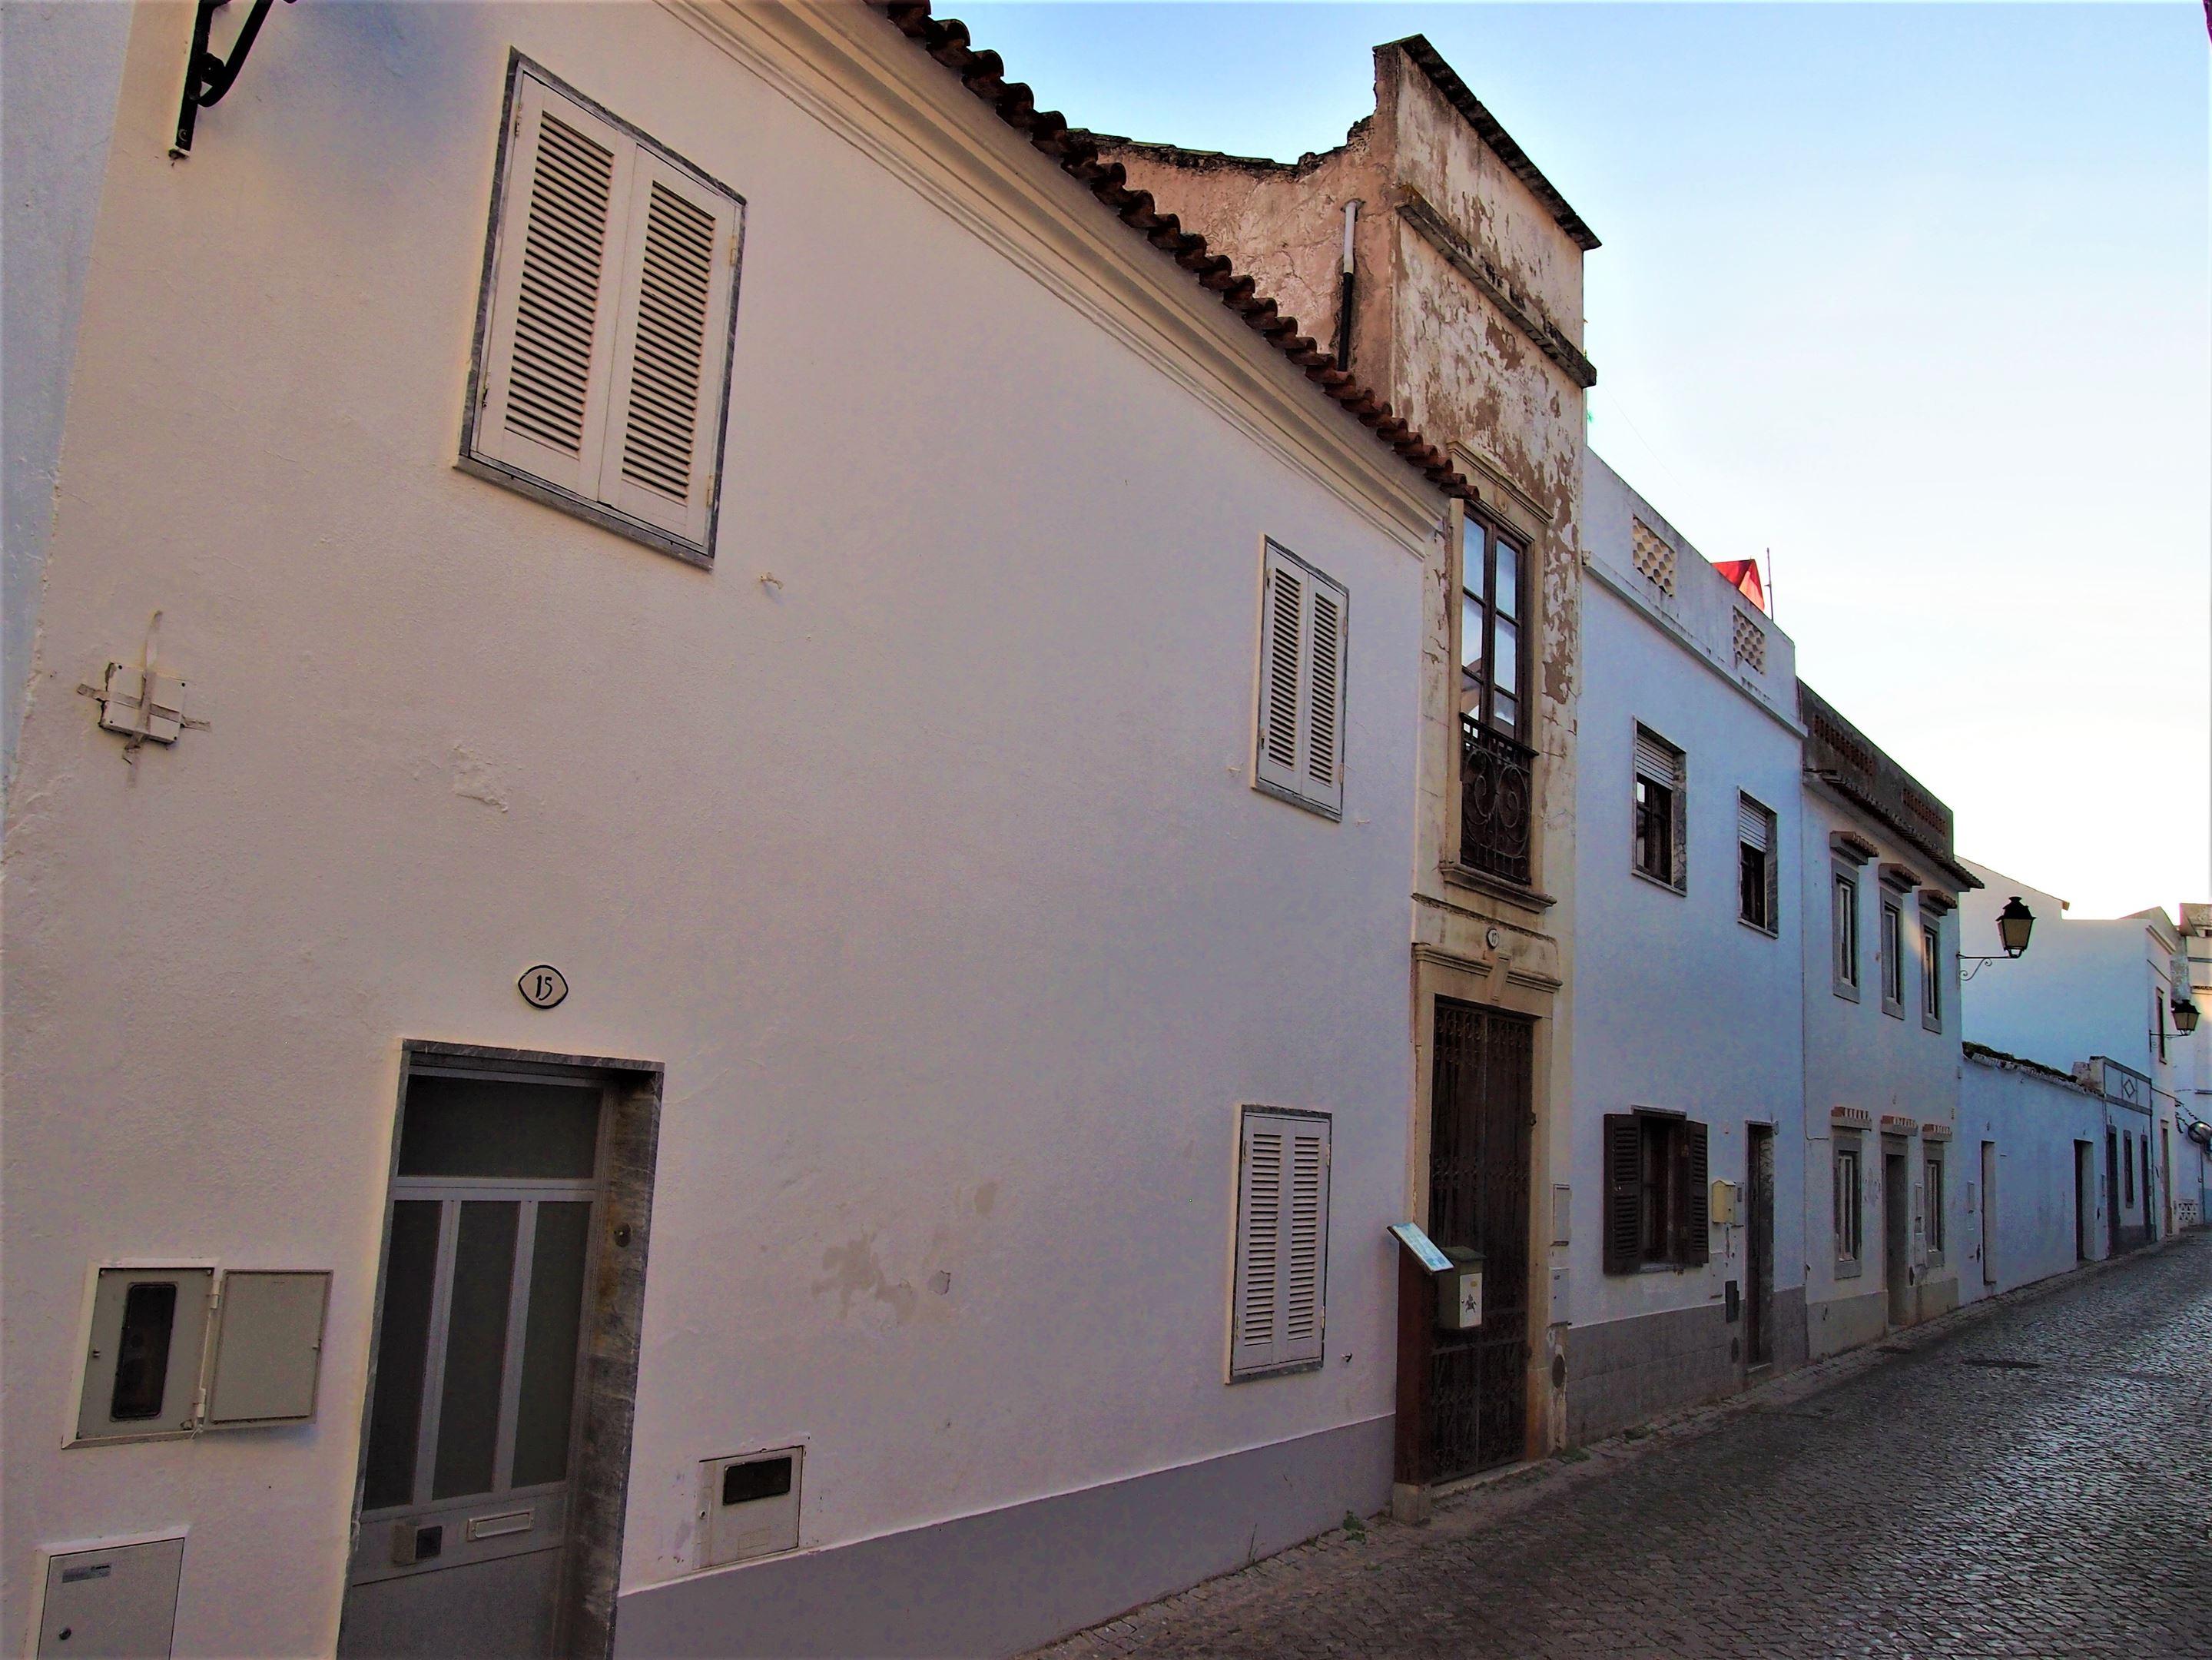 Maison natale du poète Cândido Guerreiro, Alte, Algarve